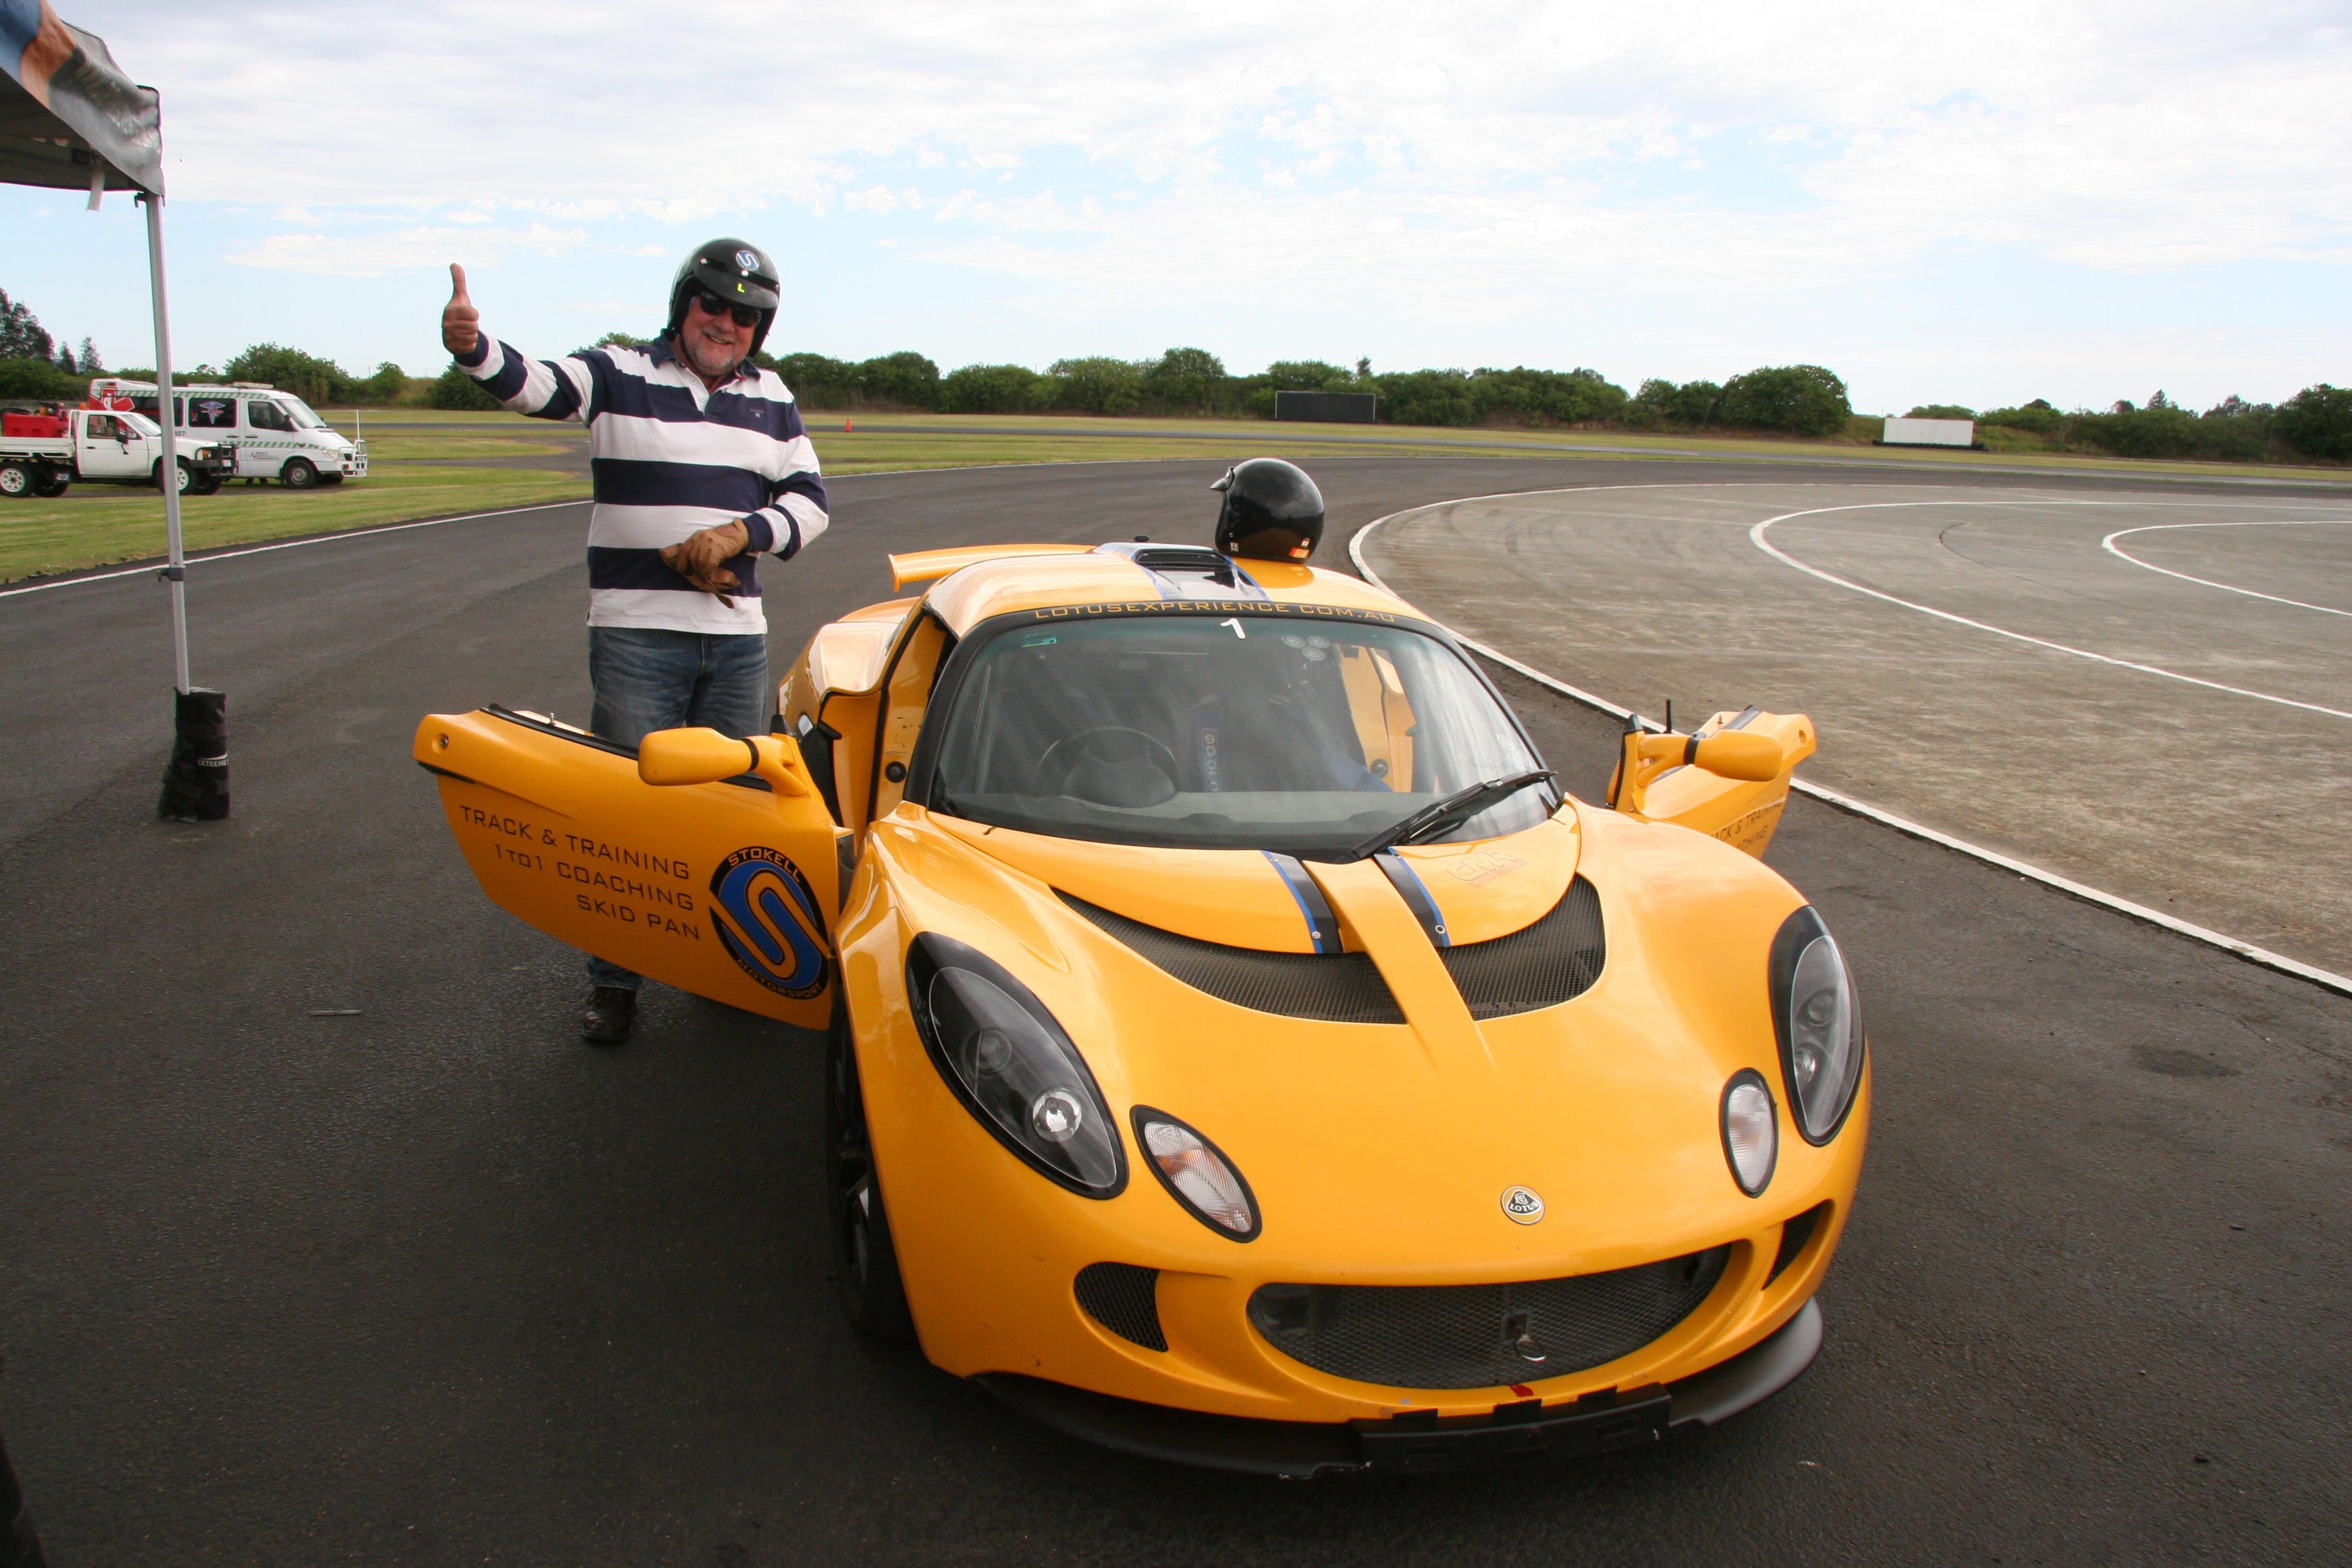 K & G Automotive Lotus Driving Experience William Borbasi